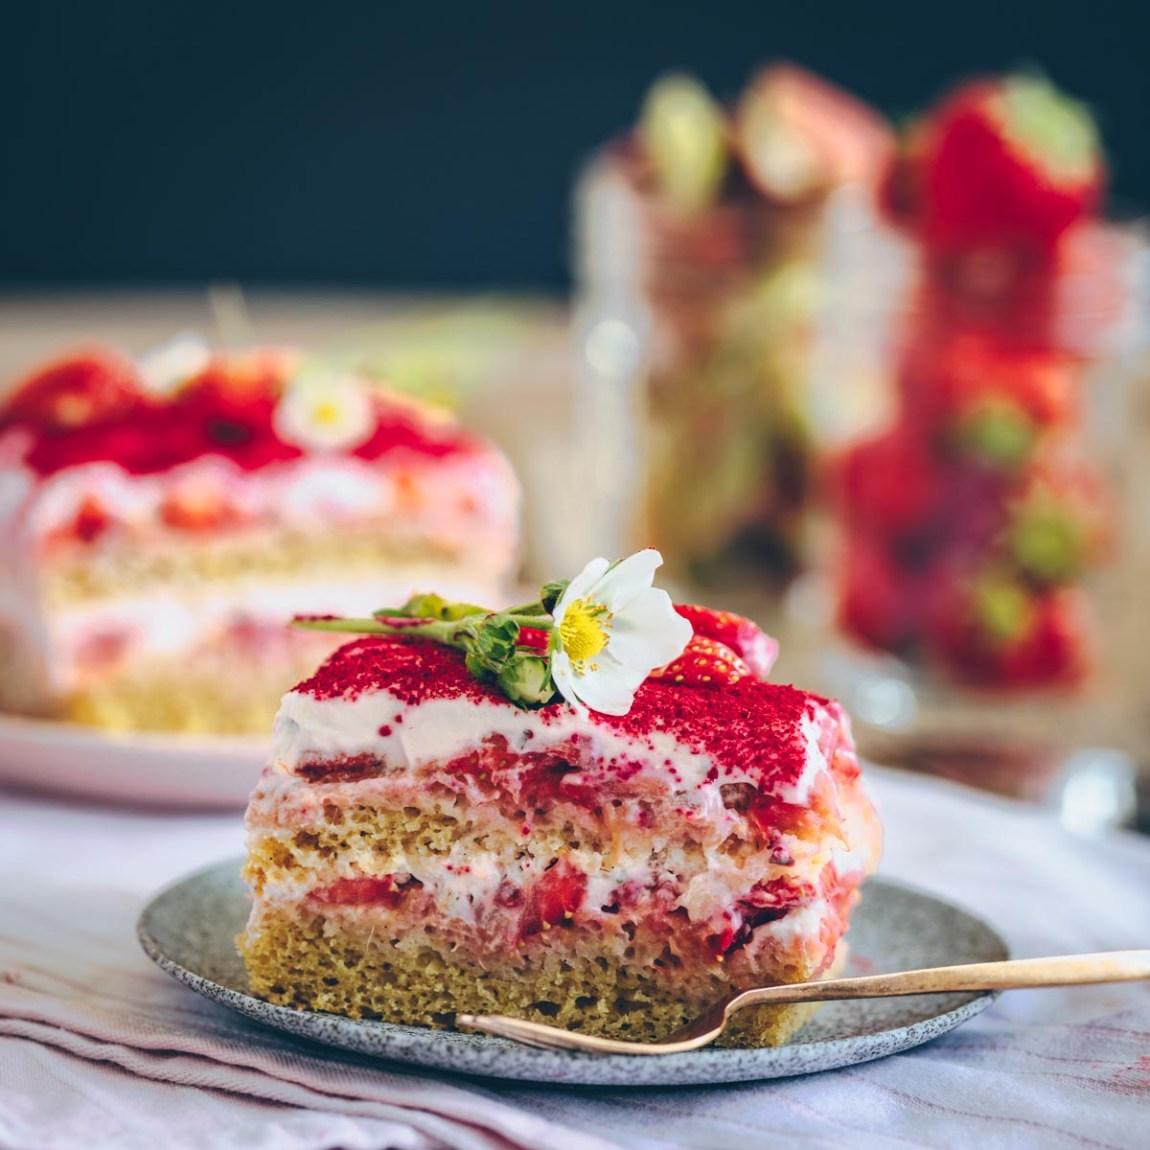 Erdbeer Rhabarber Tiramisu